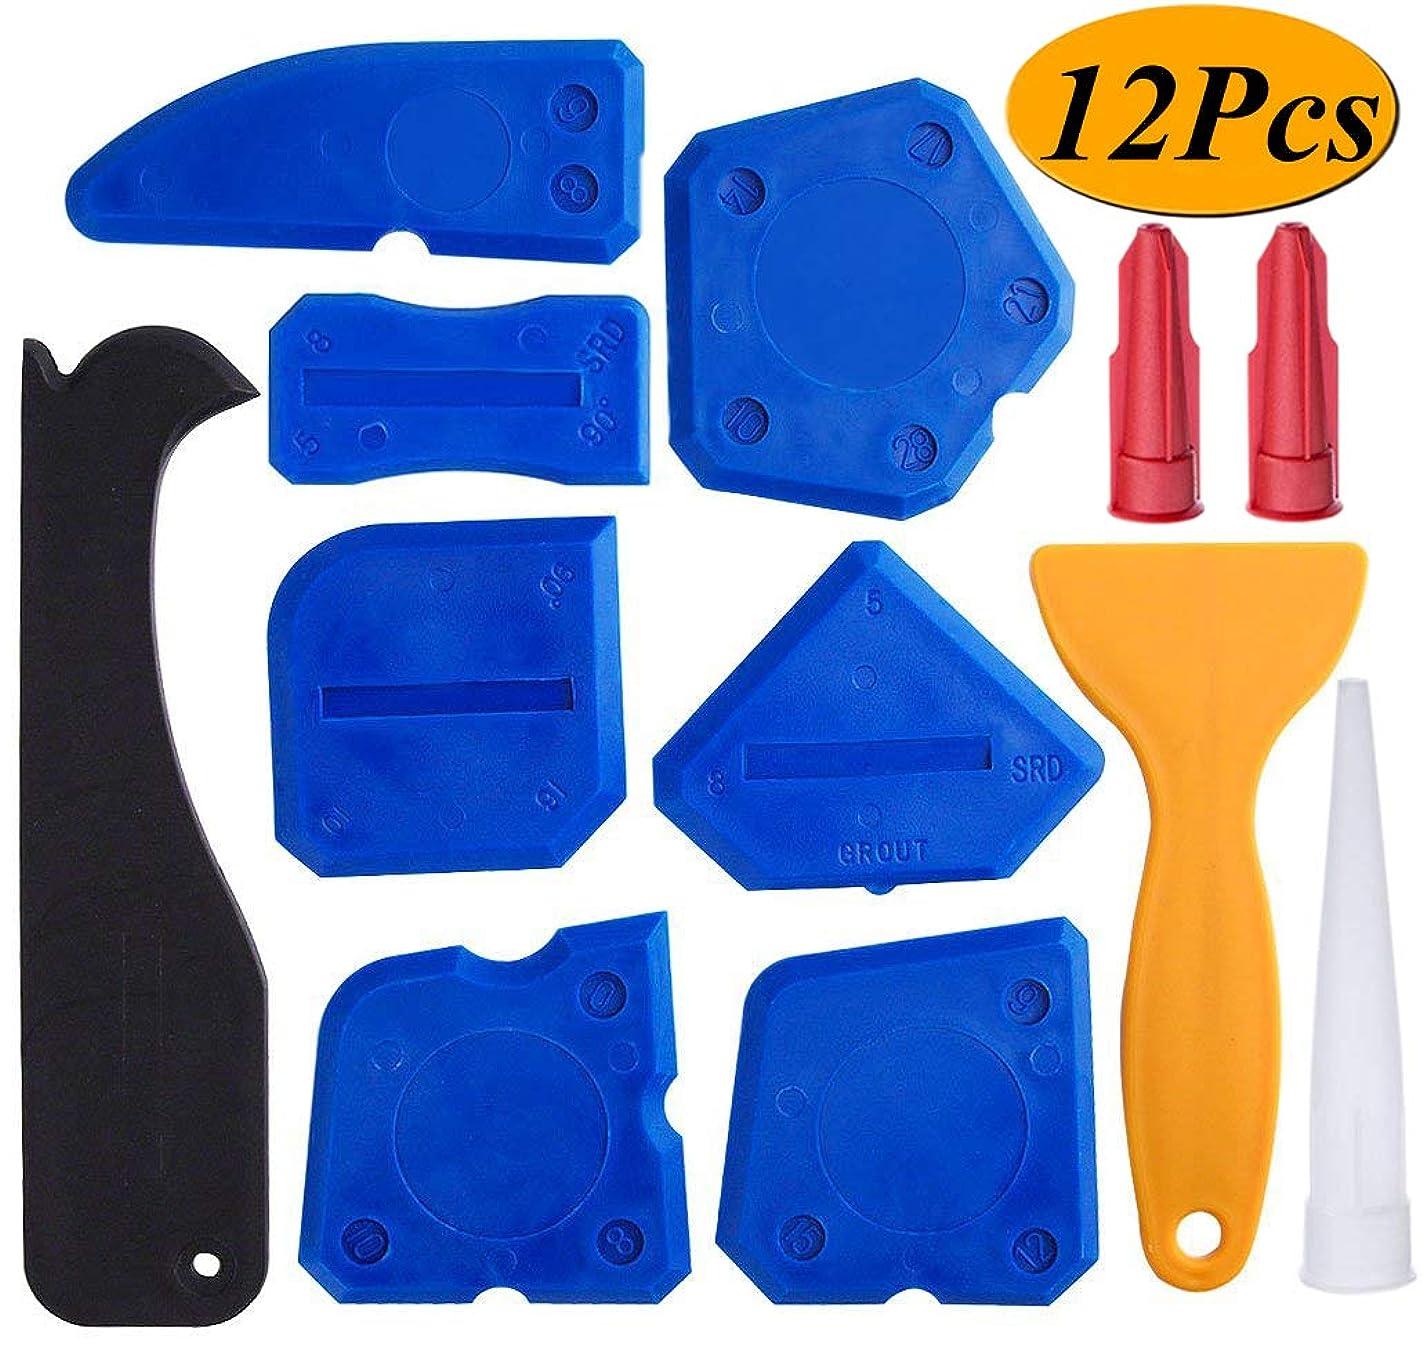 12 Pieces Caulking Tool Kit Sealant Tools Silicone Sealant Finishing Tool Grout Scraper Caulk Remover and Caulk Nozzle and Caulk Caps (Blue)